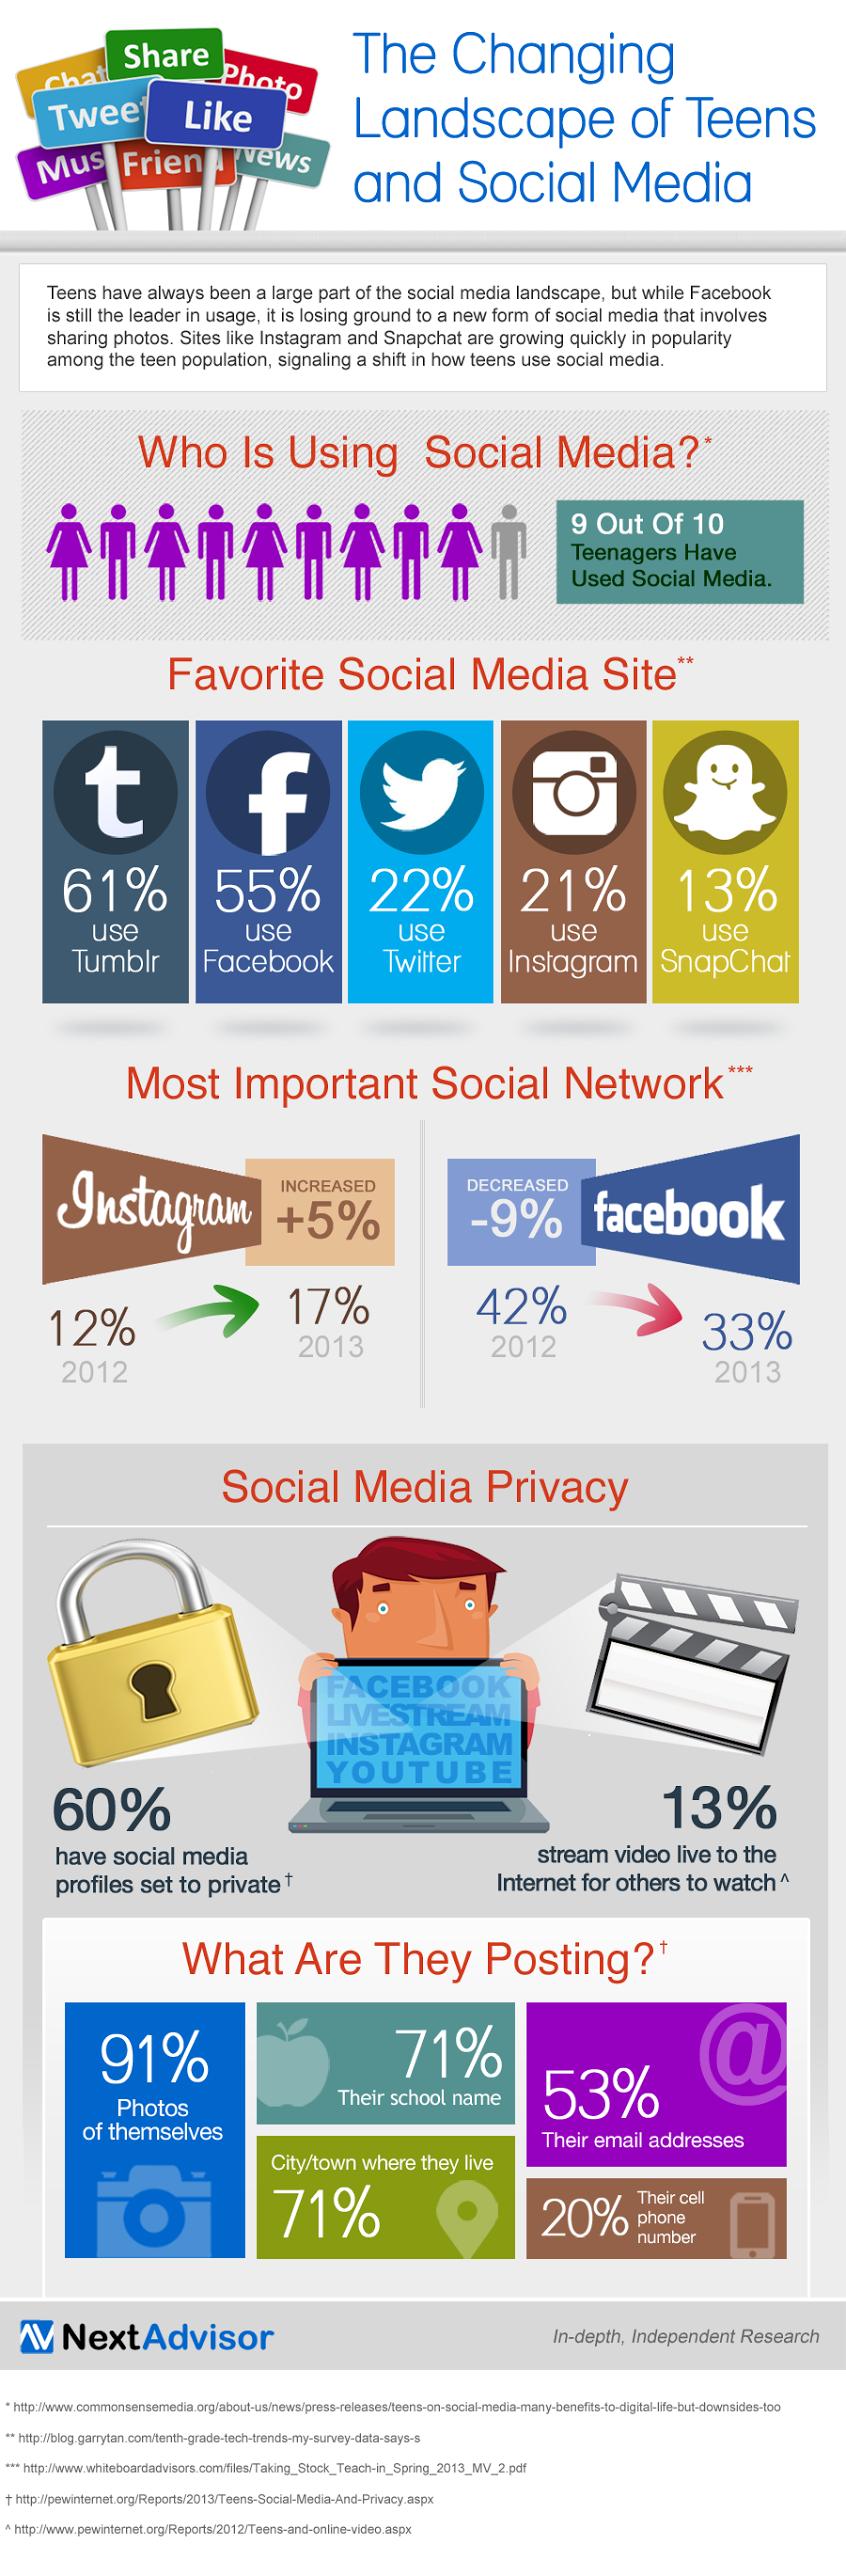 Social-Media-and-Teenagers- Facebook-losing-to-Instagram